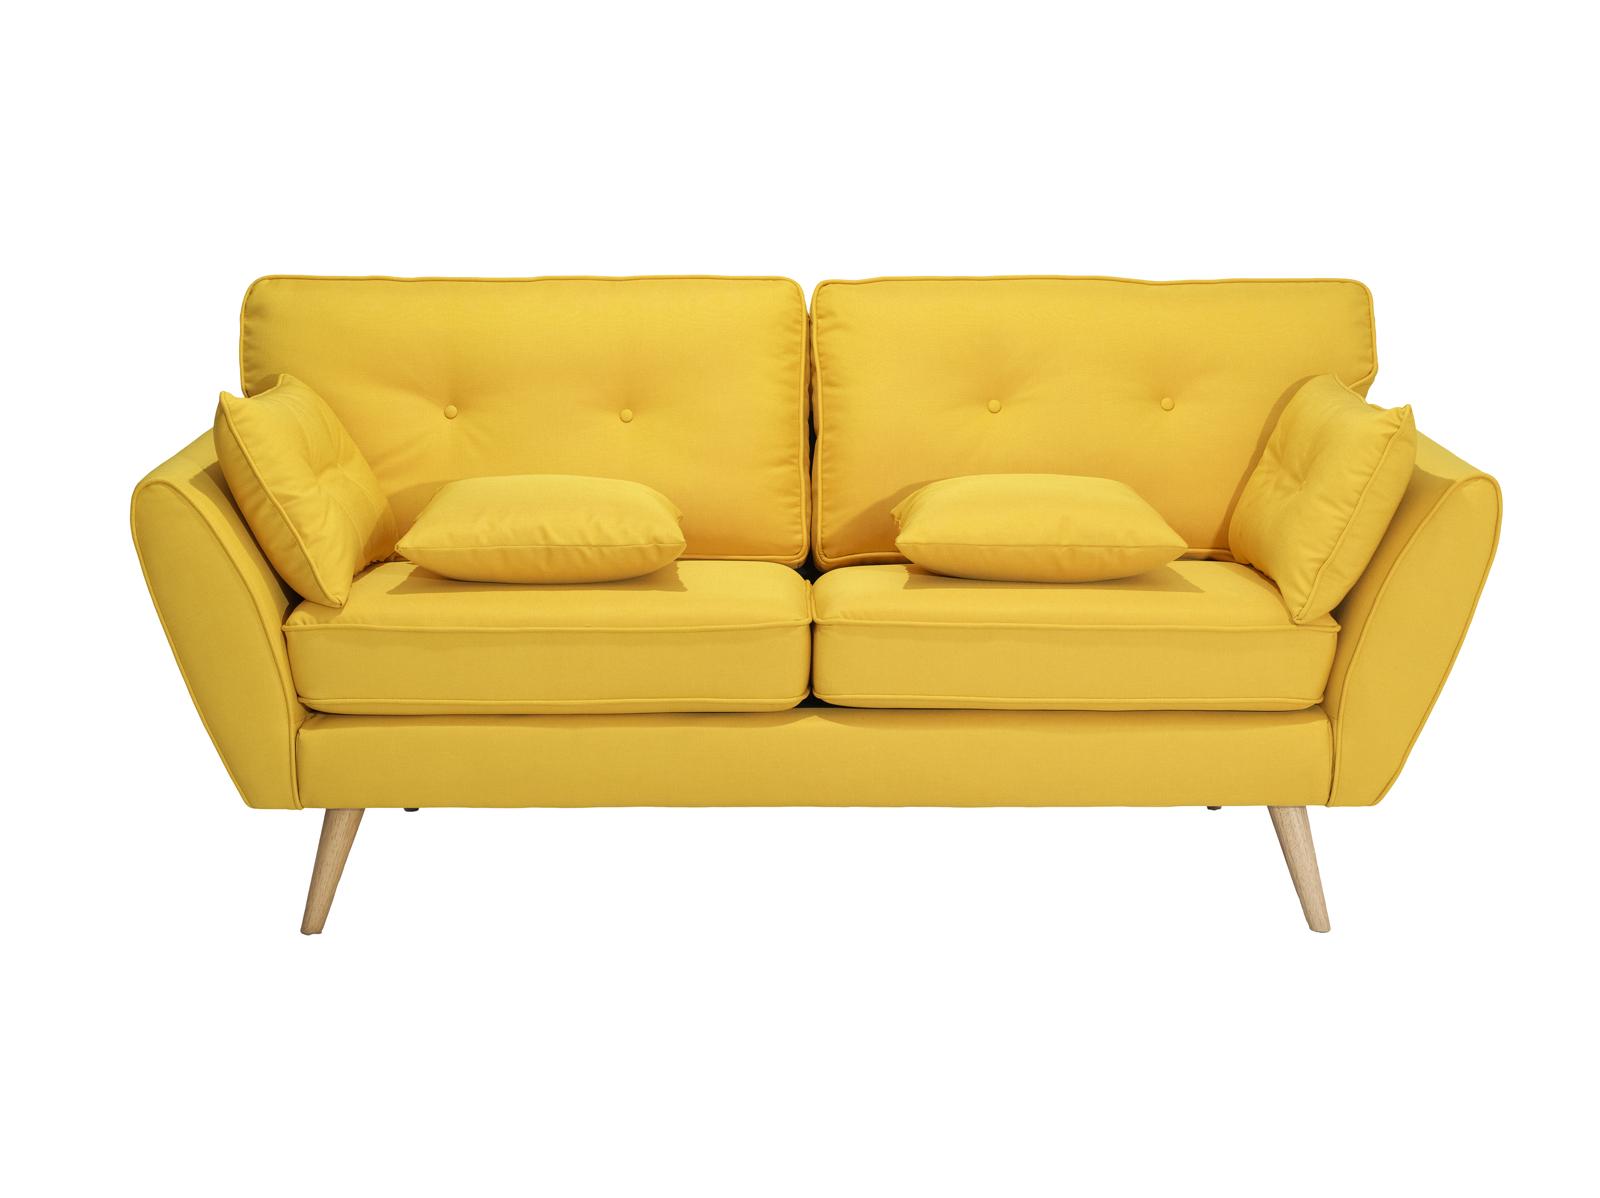 Canapea fixa tapitata cu stofa Volex Yellow